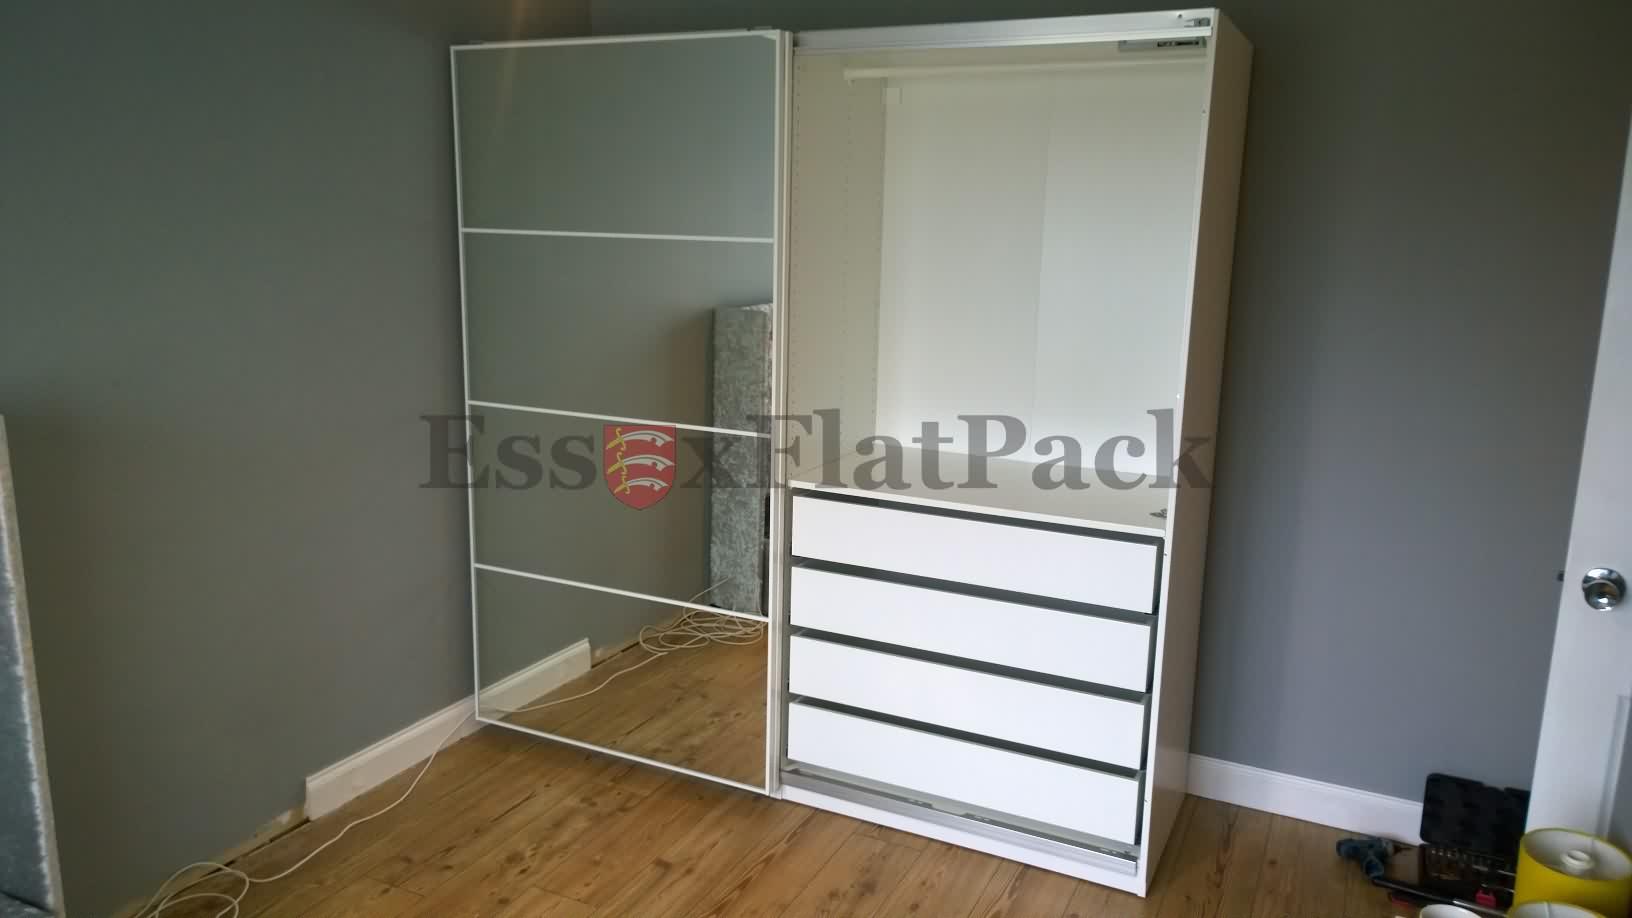 essexflatpack-furniture-20170303111342.jpg